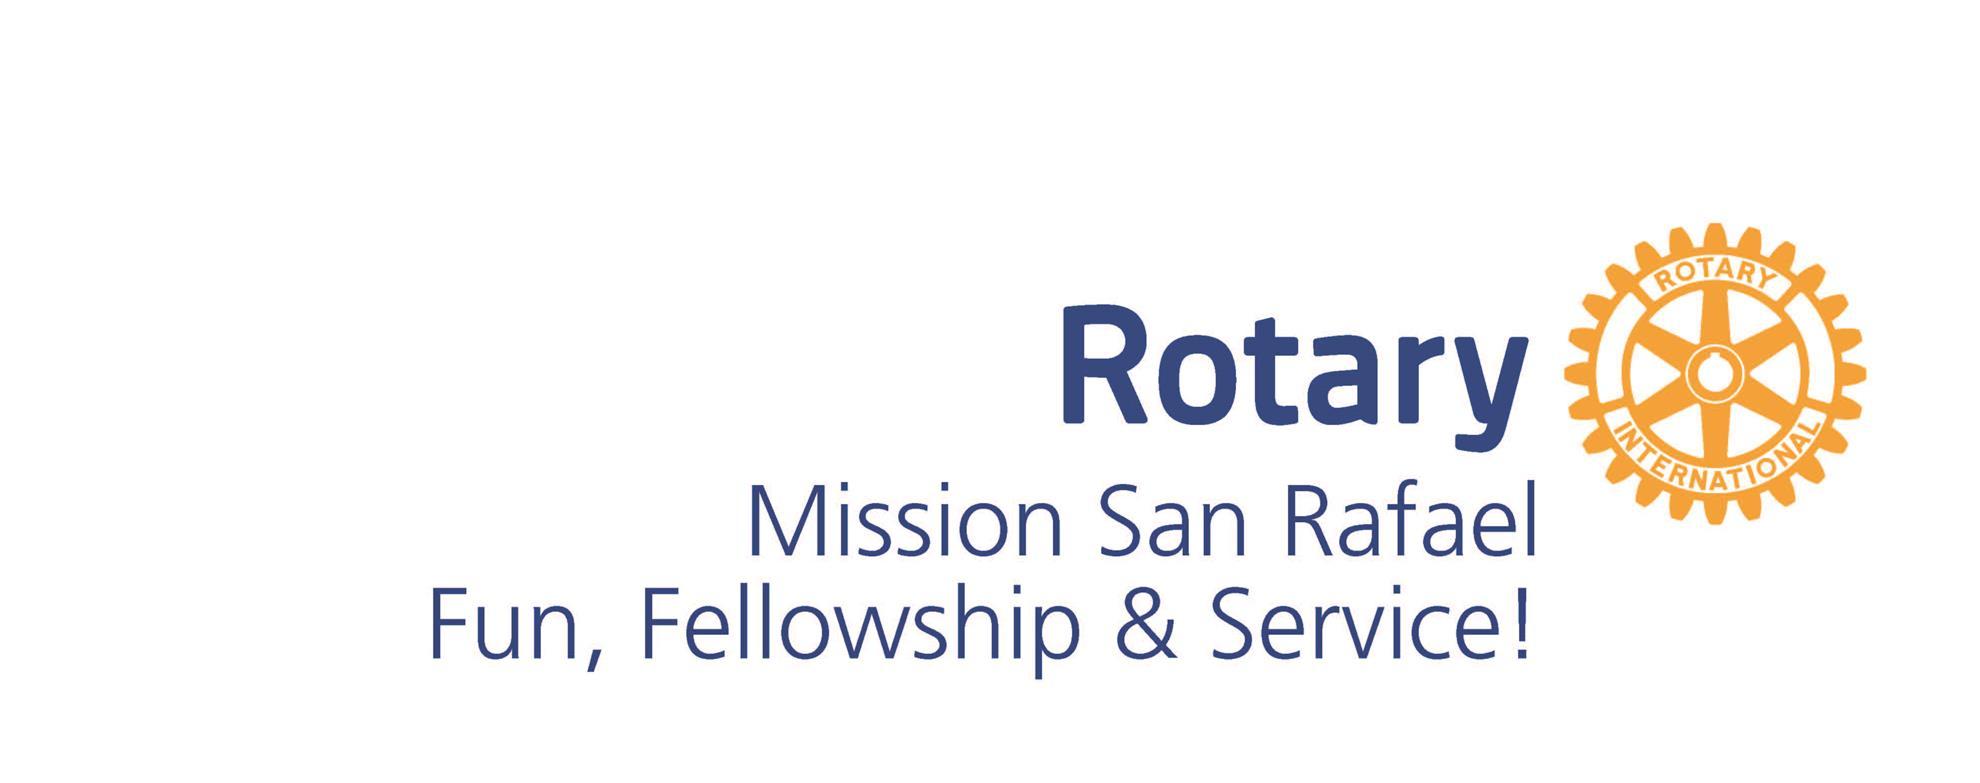 Mission San Rafael # logo